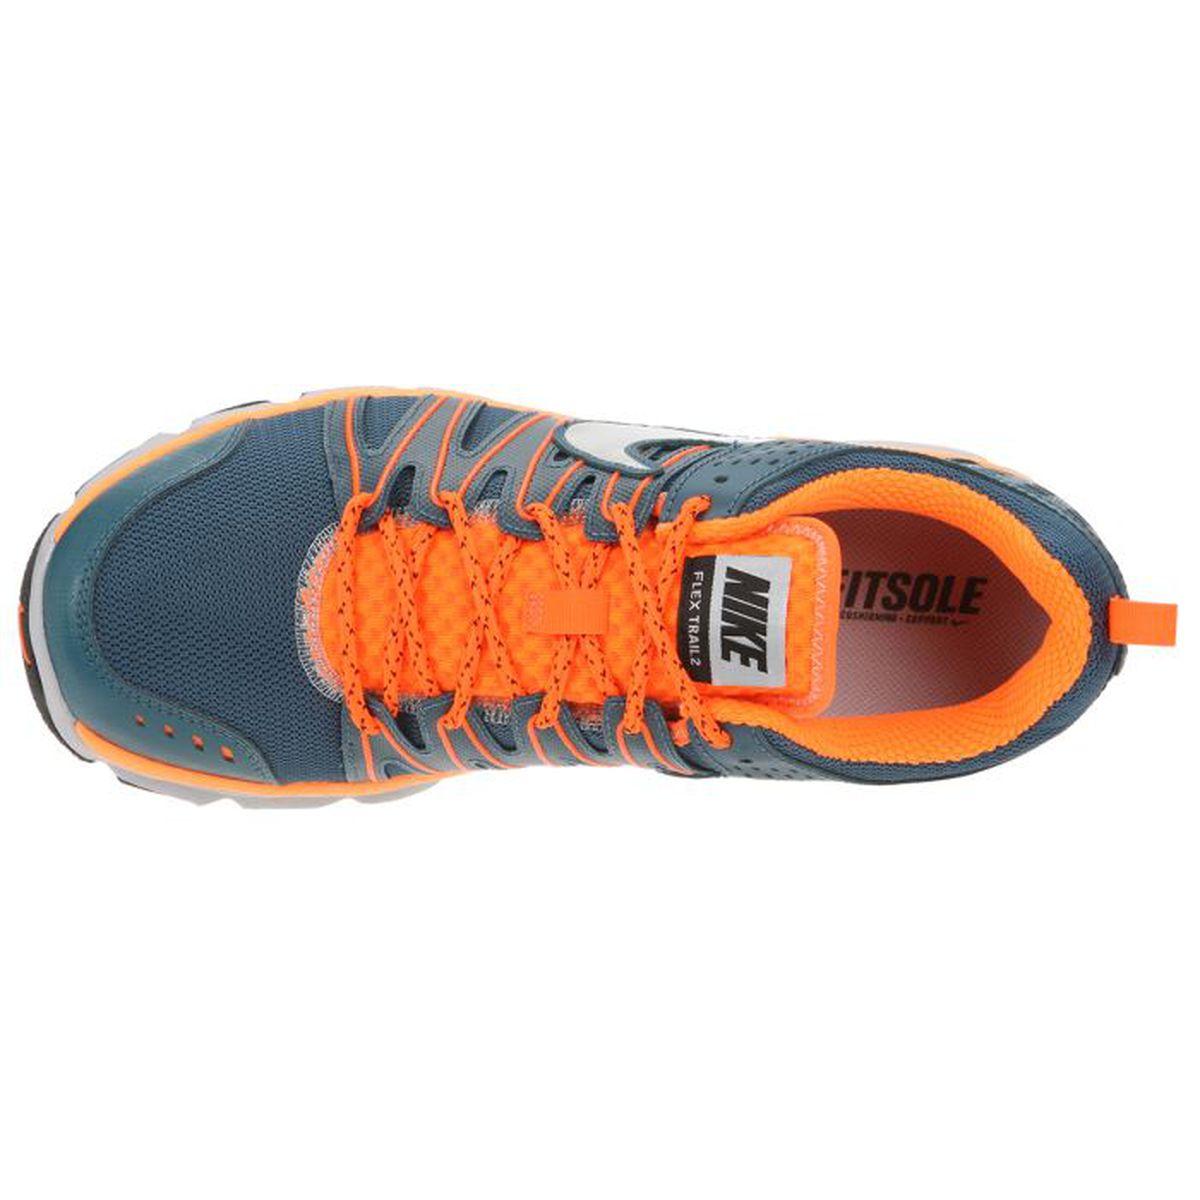 reputable site 095b5 481fd NIKE Chaussures trail running Flex Trail 2 Homme - Prix pas cher ...